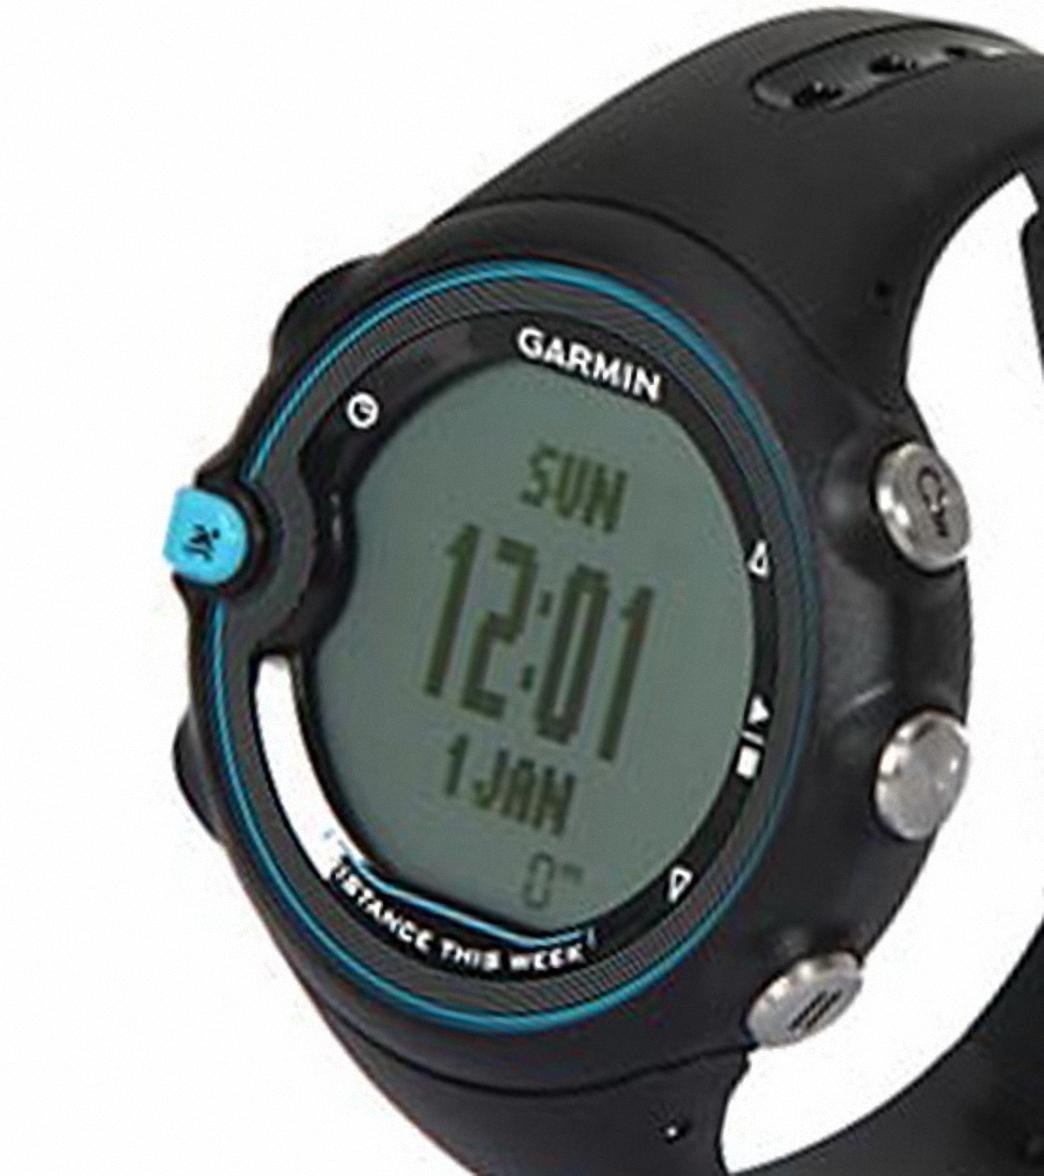 Garmin swim training waterproof watch black at free shipping for Garmin swim pool swimming watch